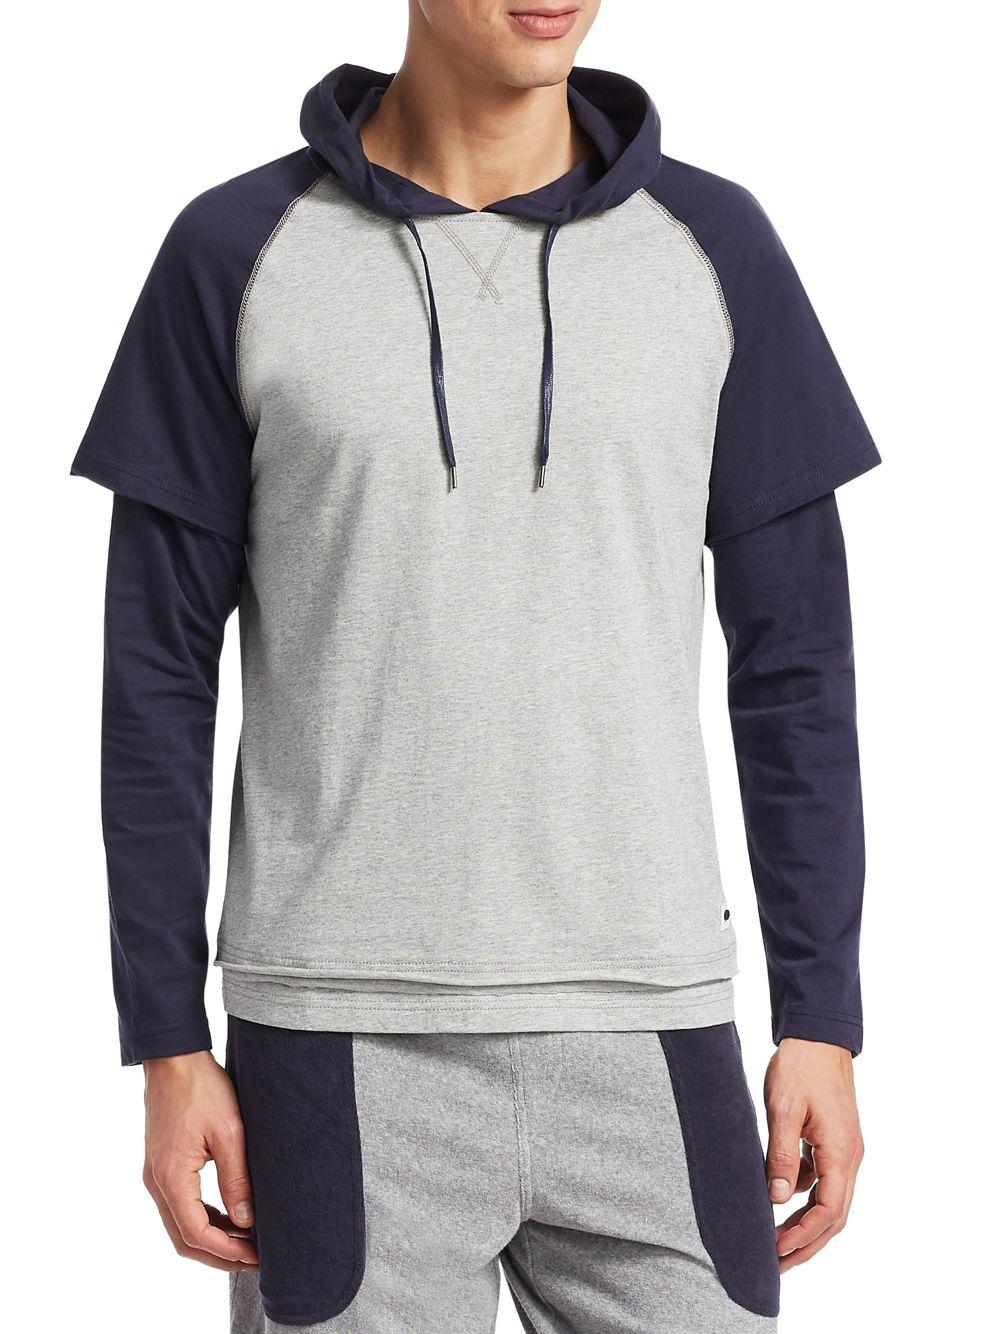 9d2c52b4 Madison Supply. Men's Gray Long-sleeve Colorblock Cotton Baseball Hoodie